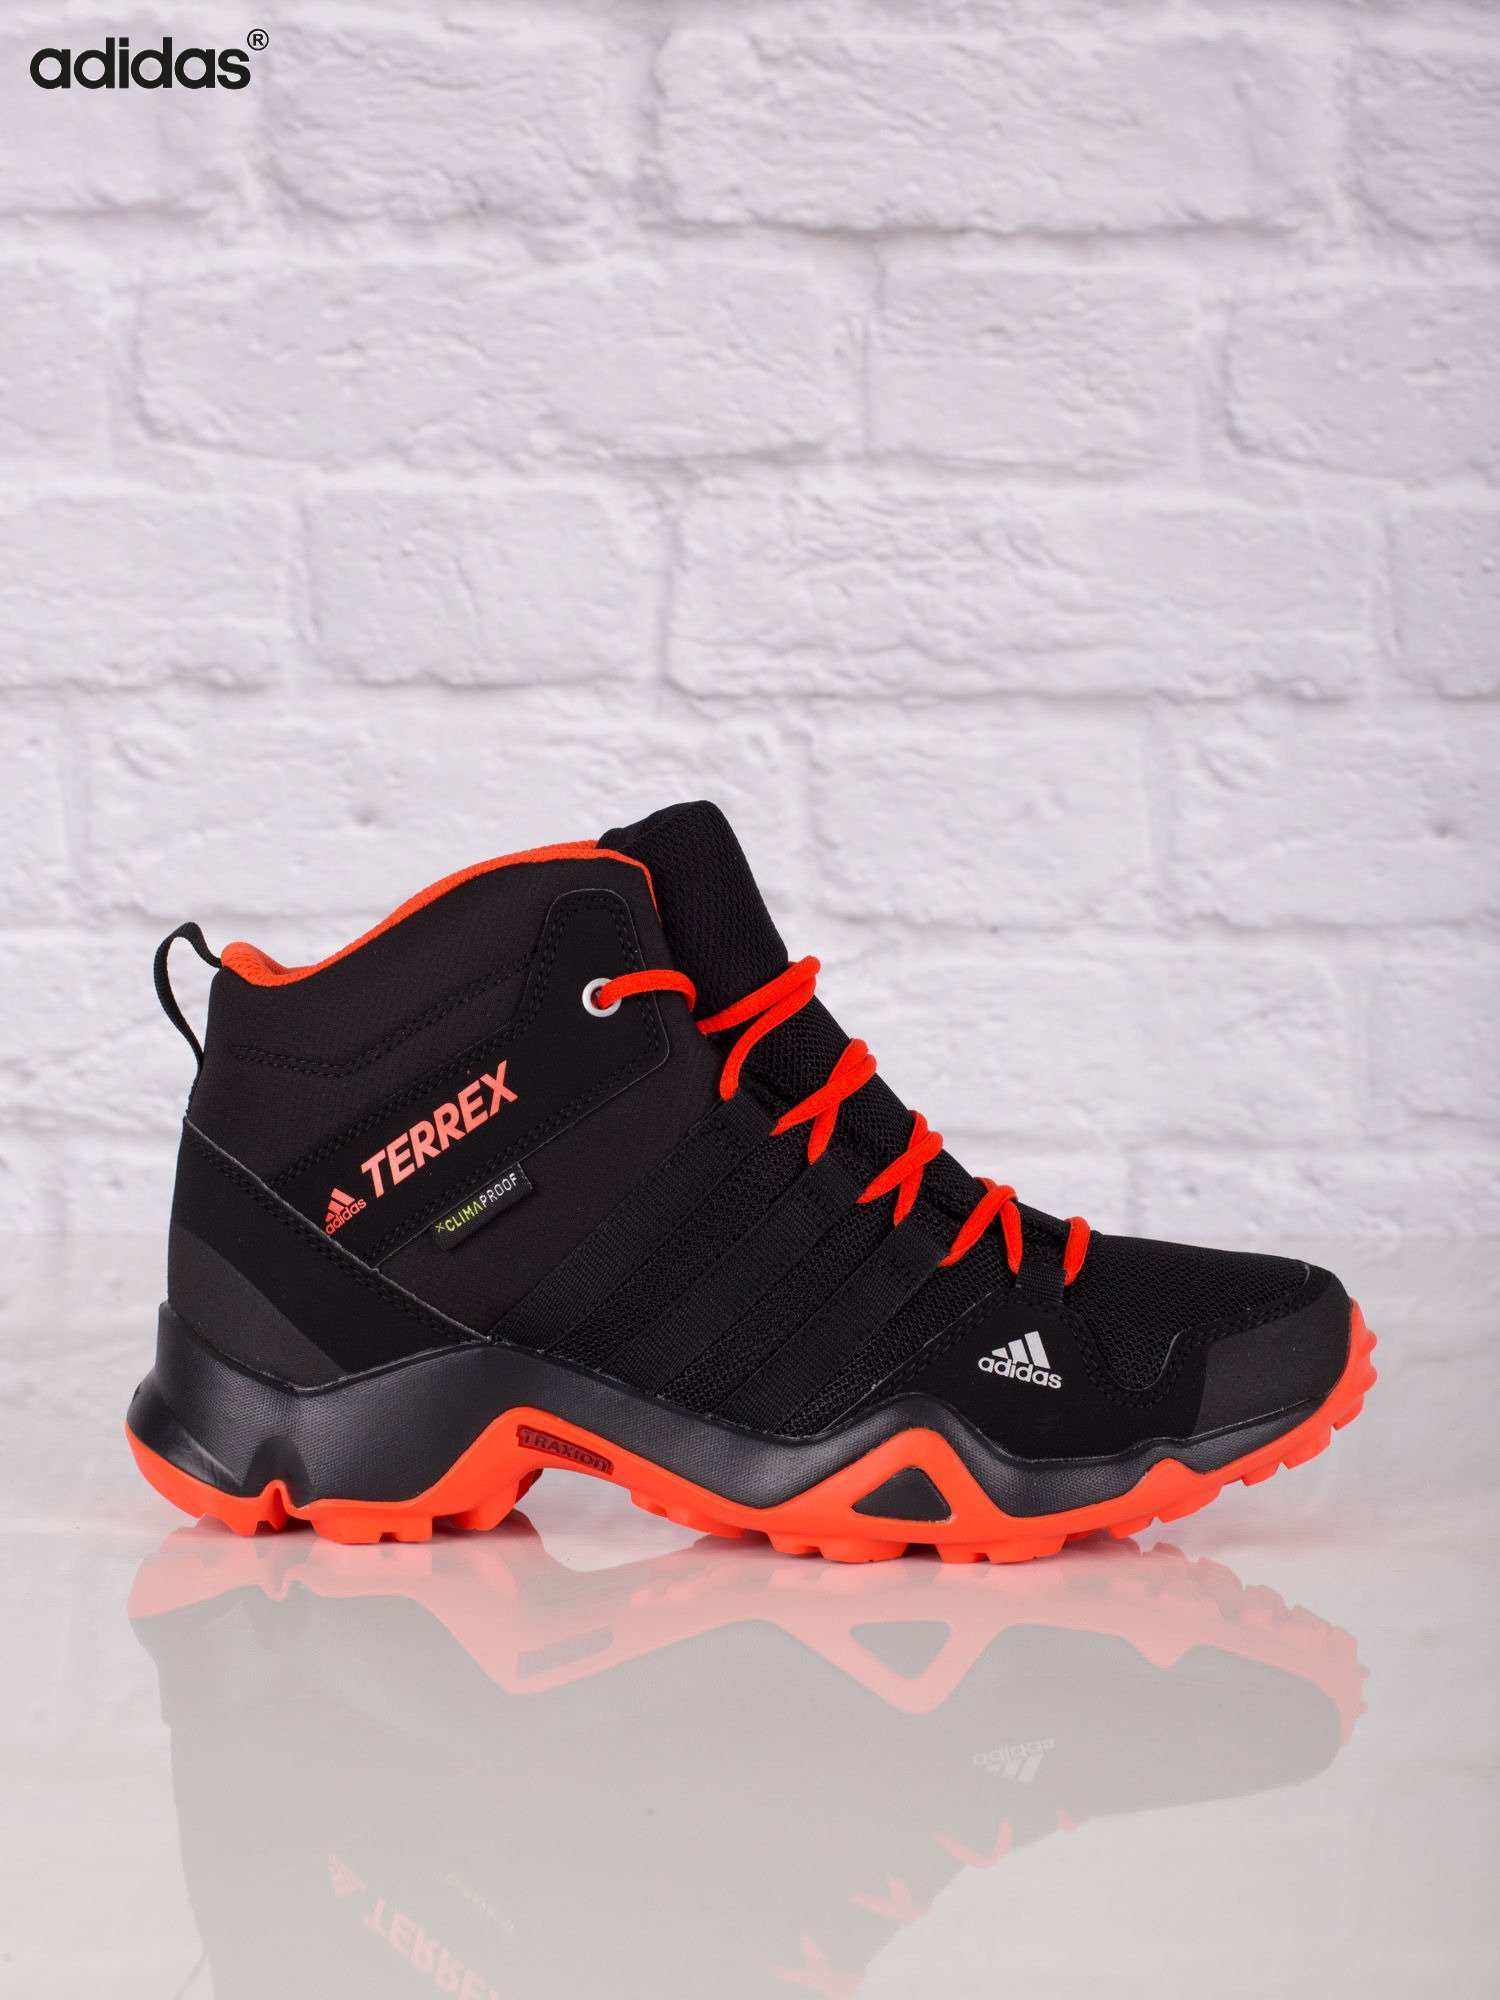 Buty Trekkingowe Adidas Kup Online | Damskie Adidas AX2R Mid